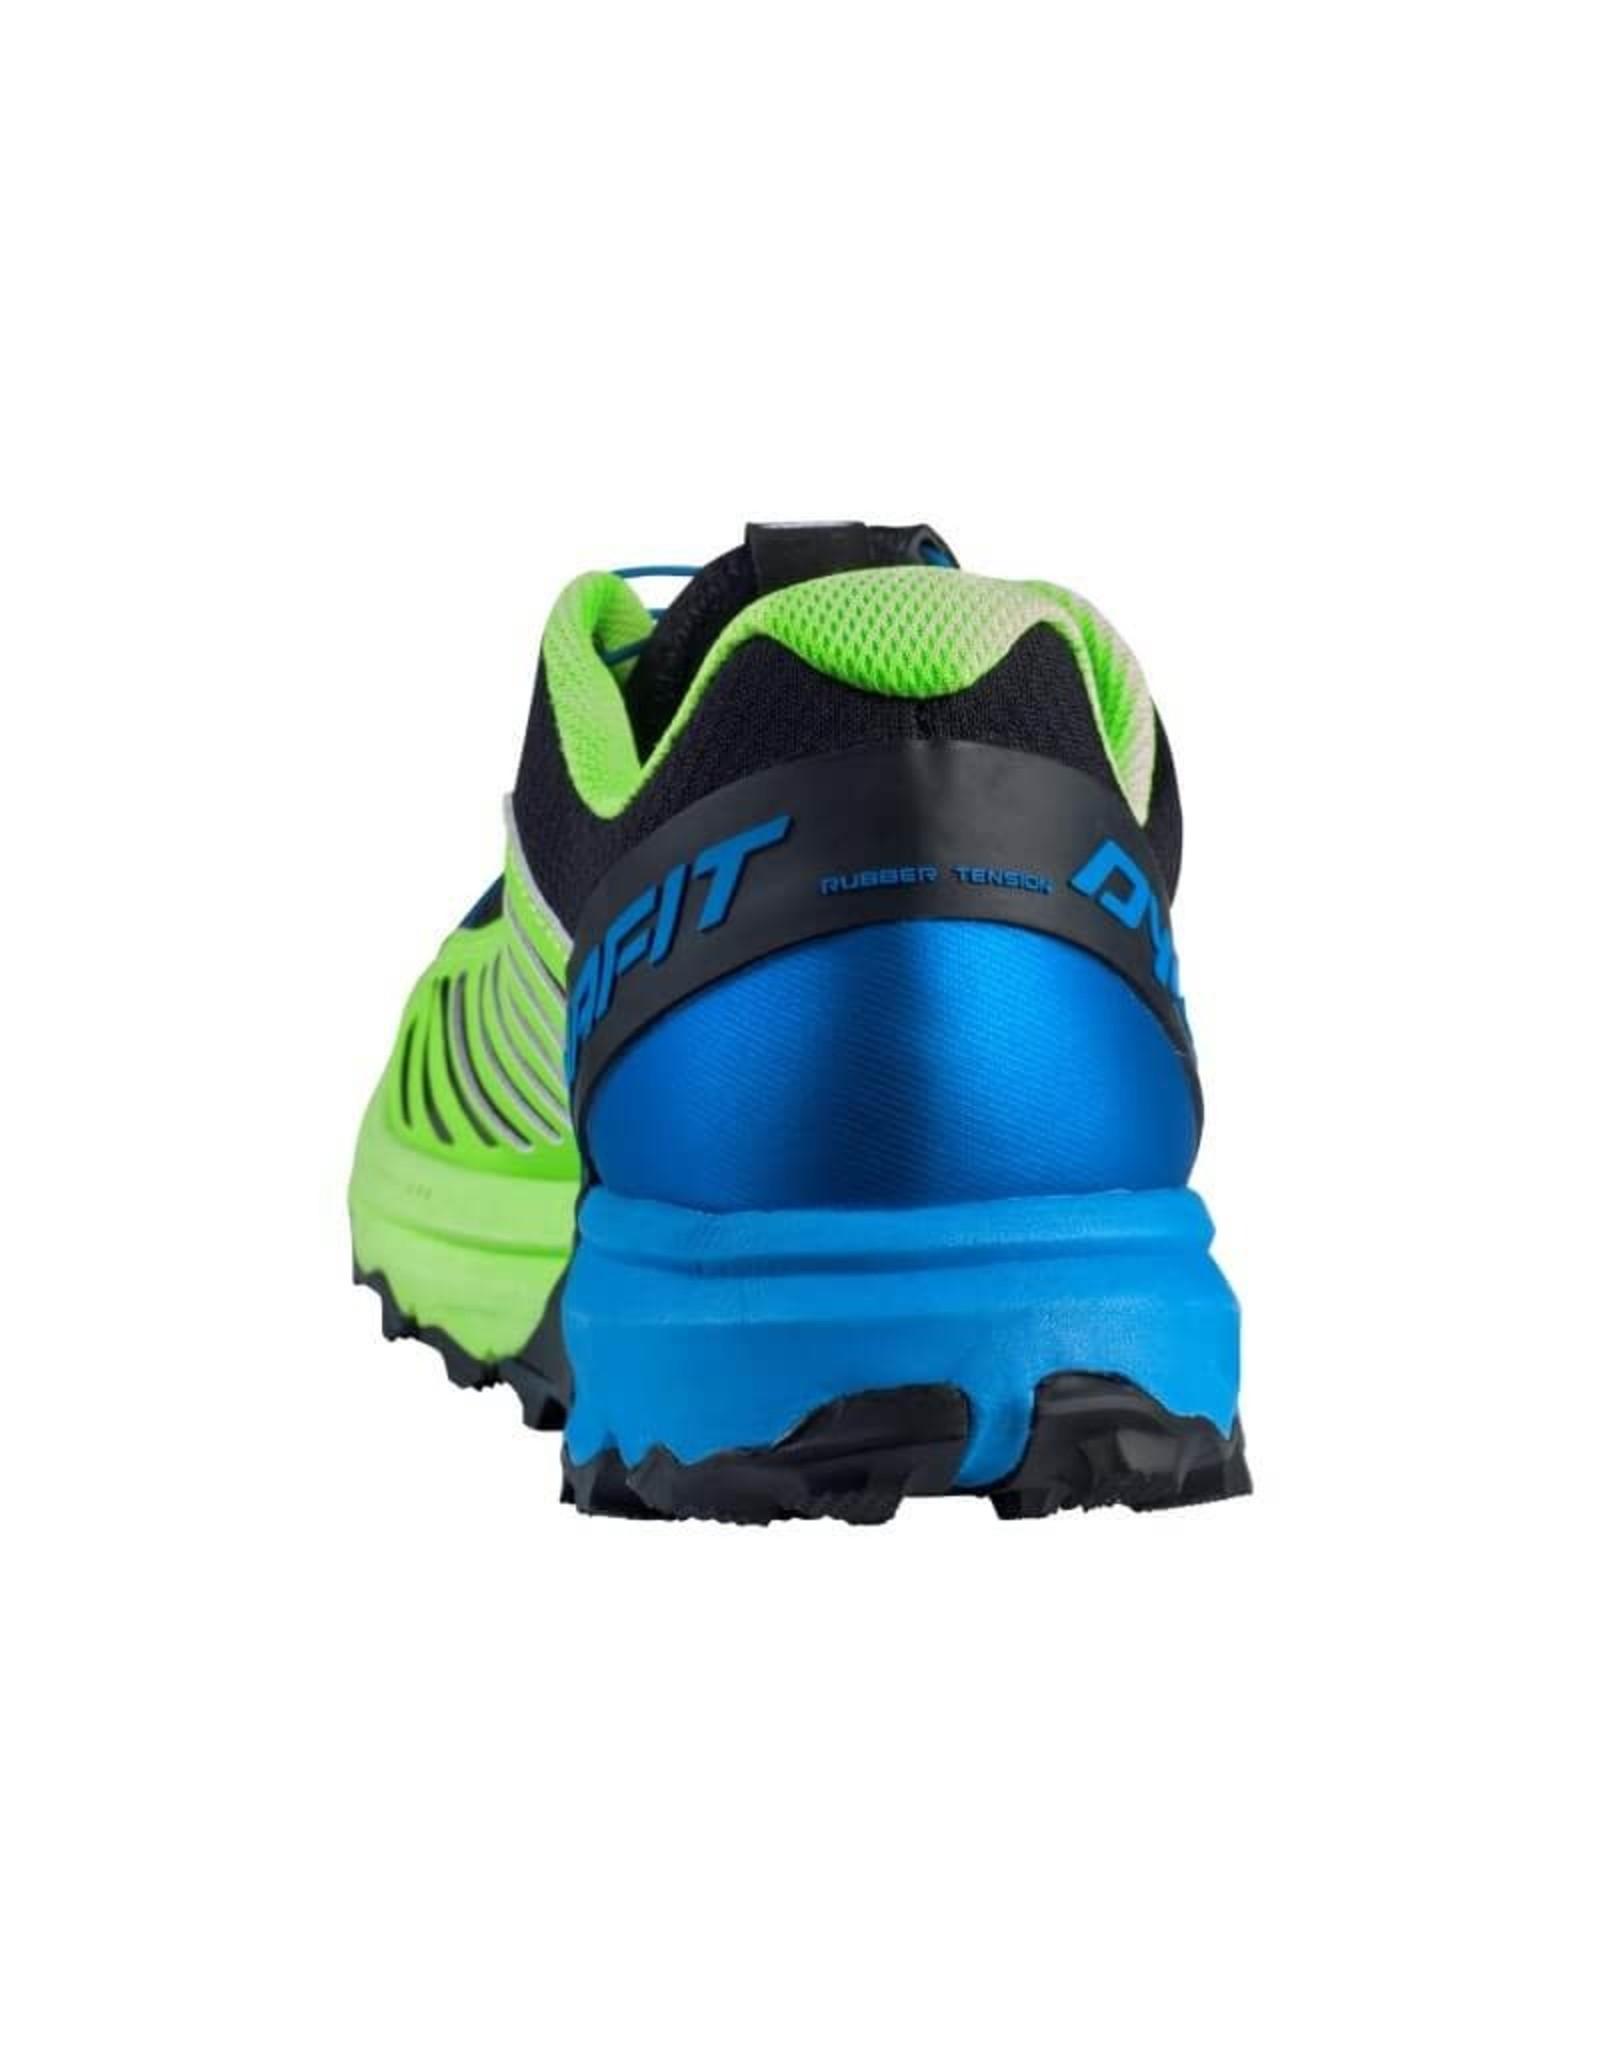 Dynafit Dynafit Alpine Pro Running Shoe - Men